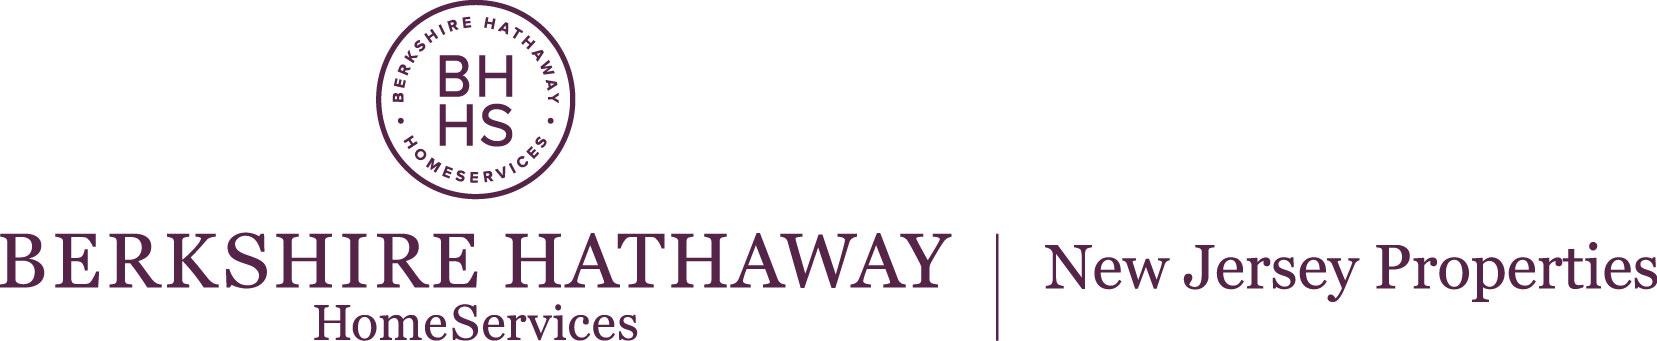 BHHSNJP logo